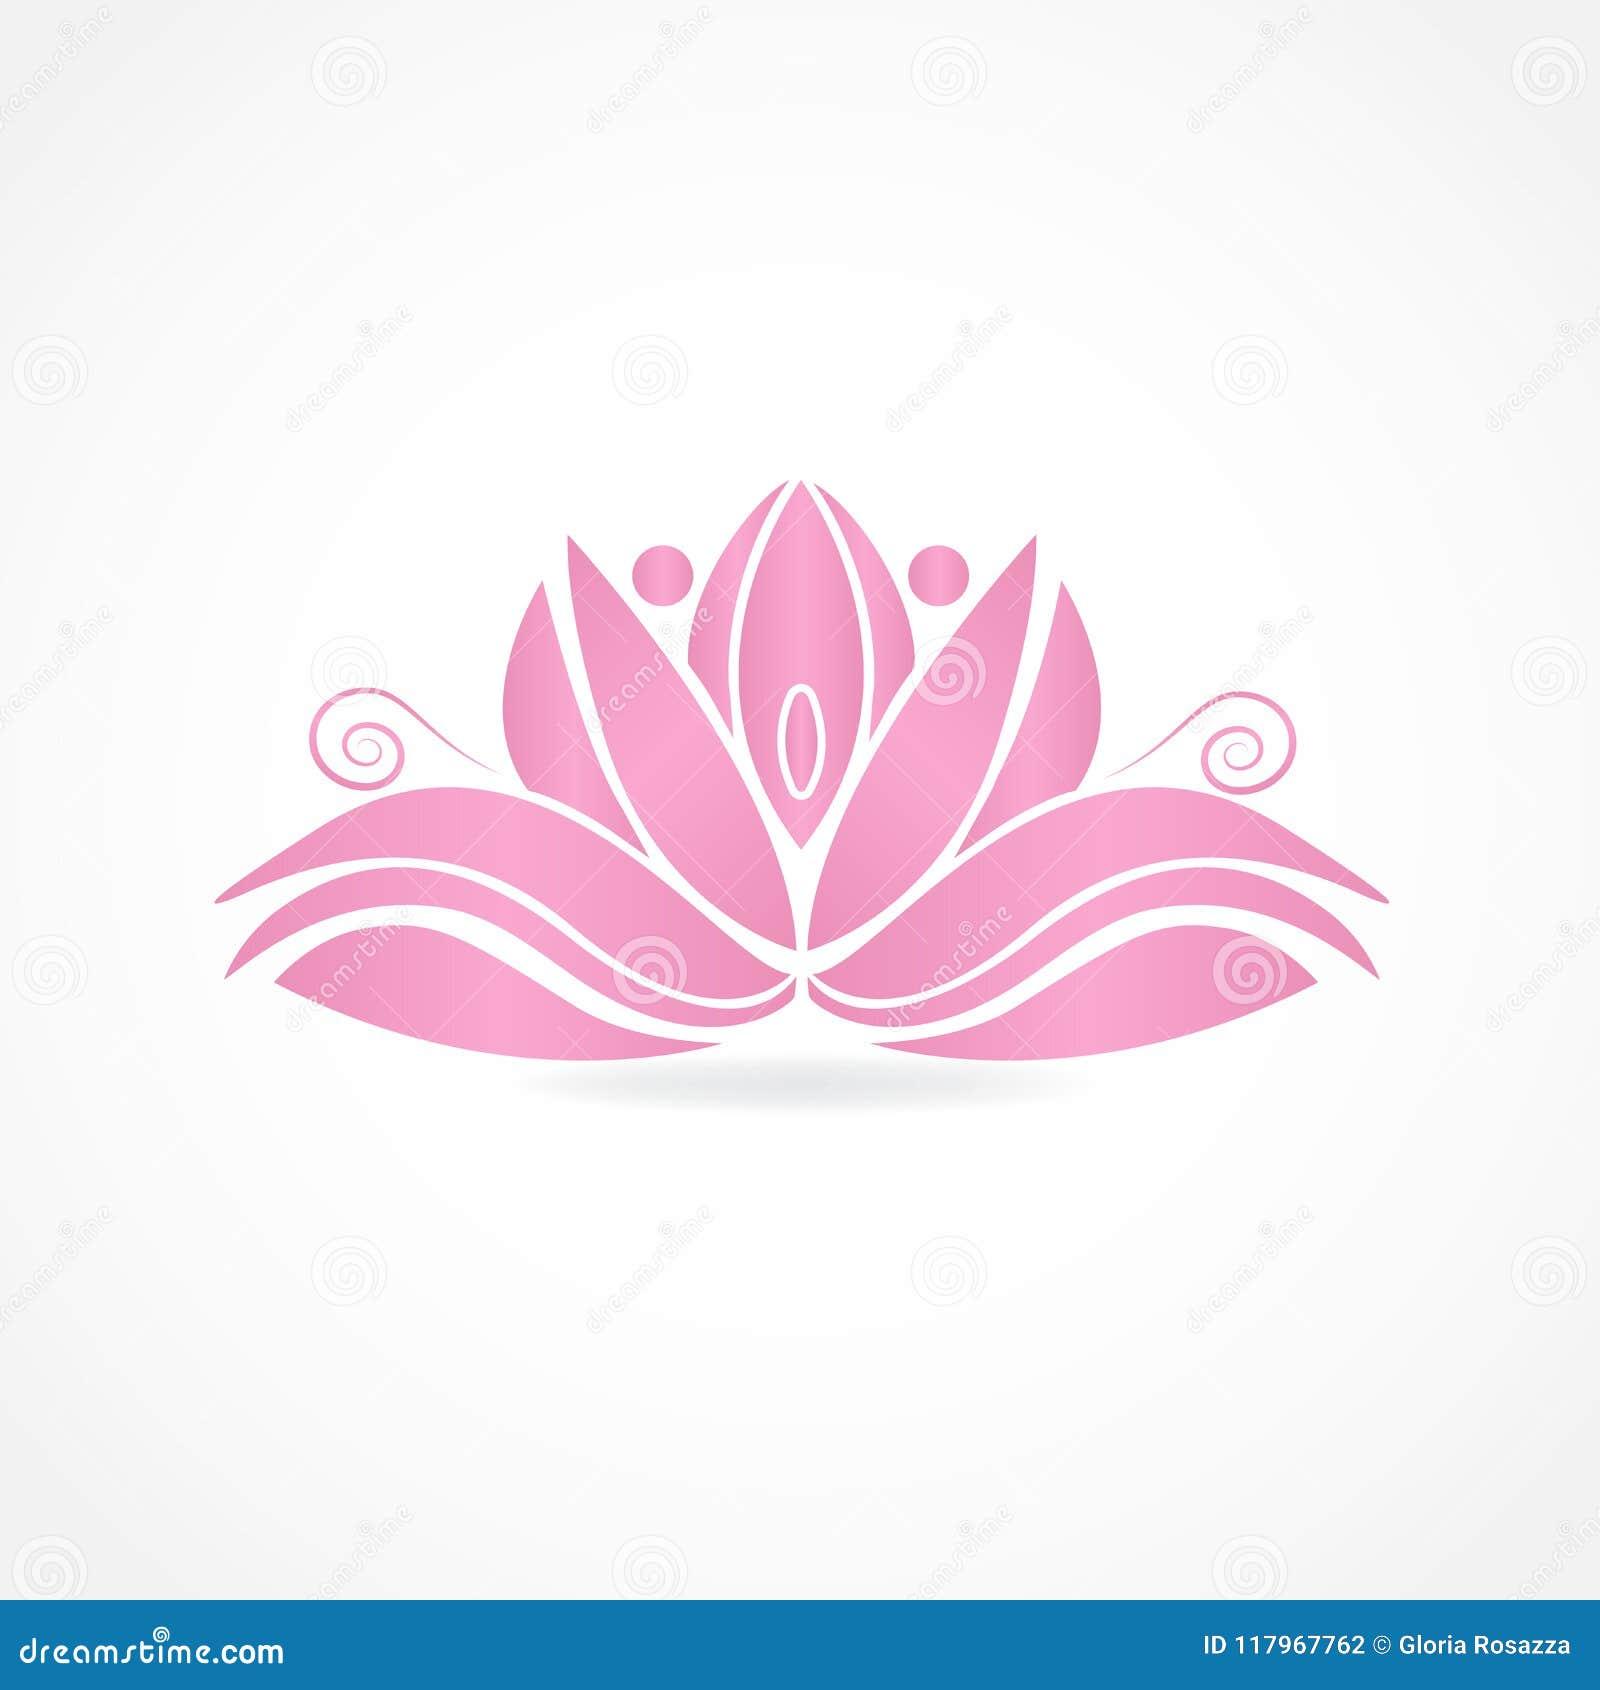 Logo lotus flower people symbol of yoga vector image illustration download logo lotus flower people symbol of yoga vector image illustration graphic design stock vector izmirmasajfo